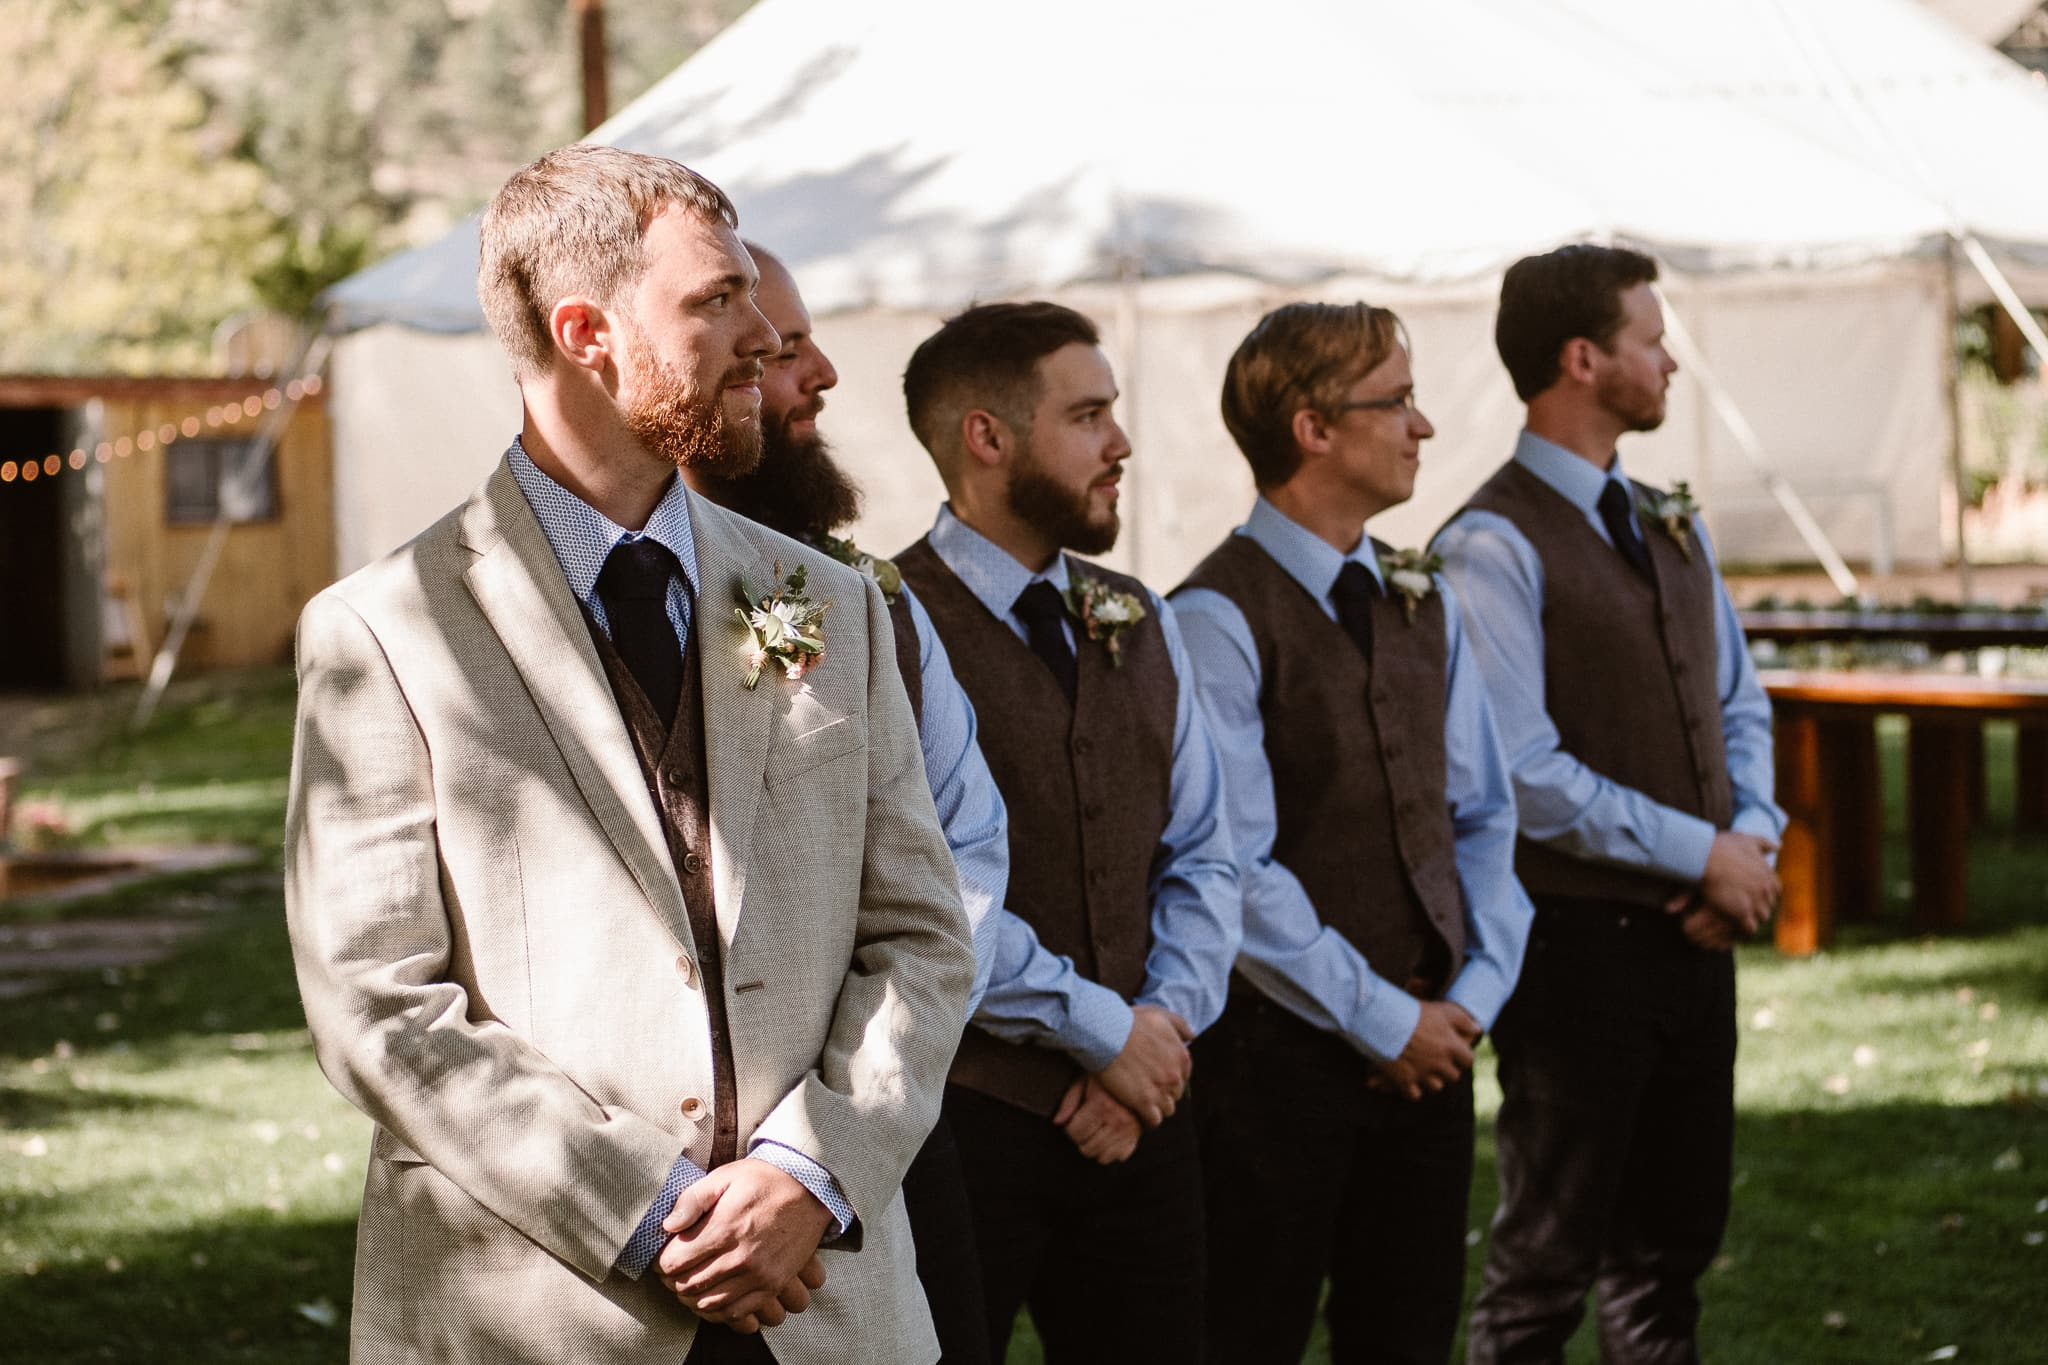 Lyons Farmette wedding photographer, Colorado intimate wedding photographer, wedding ceremony, groom watching bride walk down the aisle